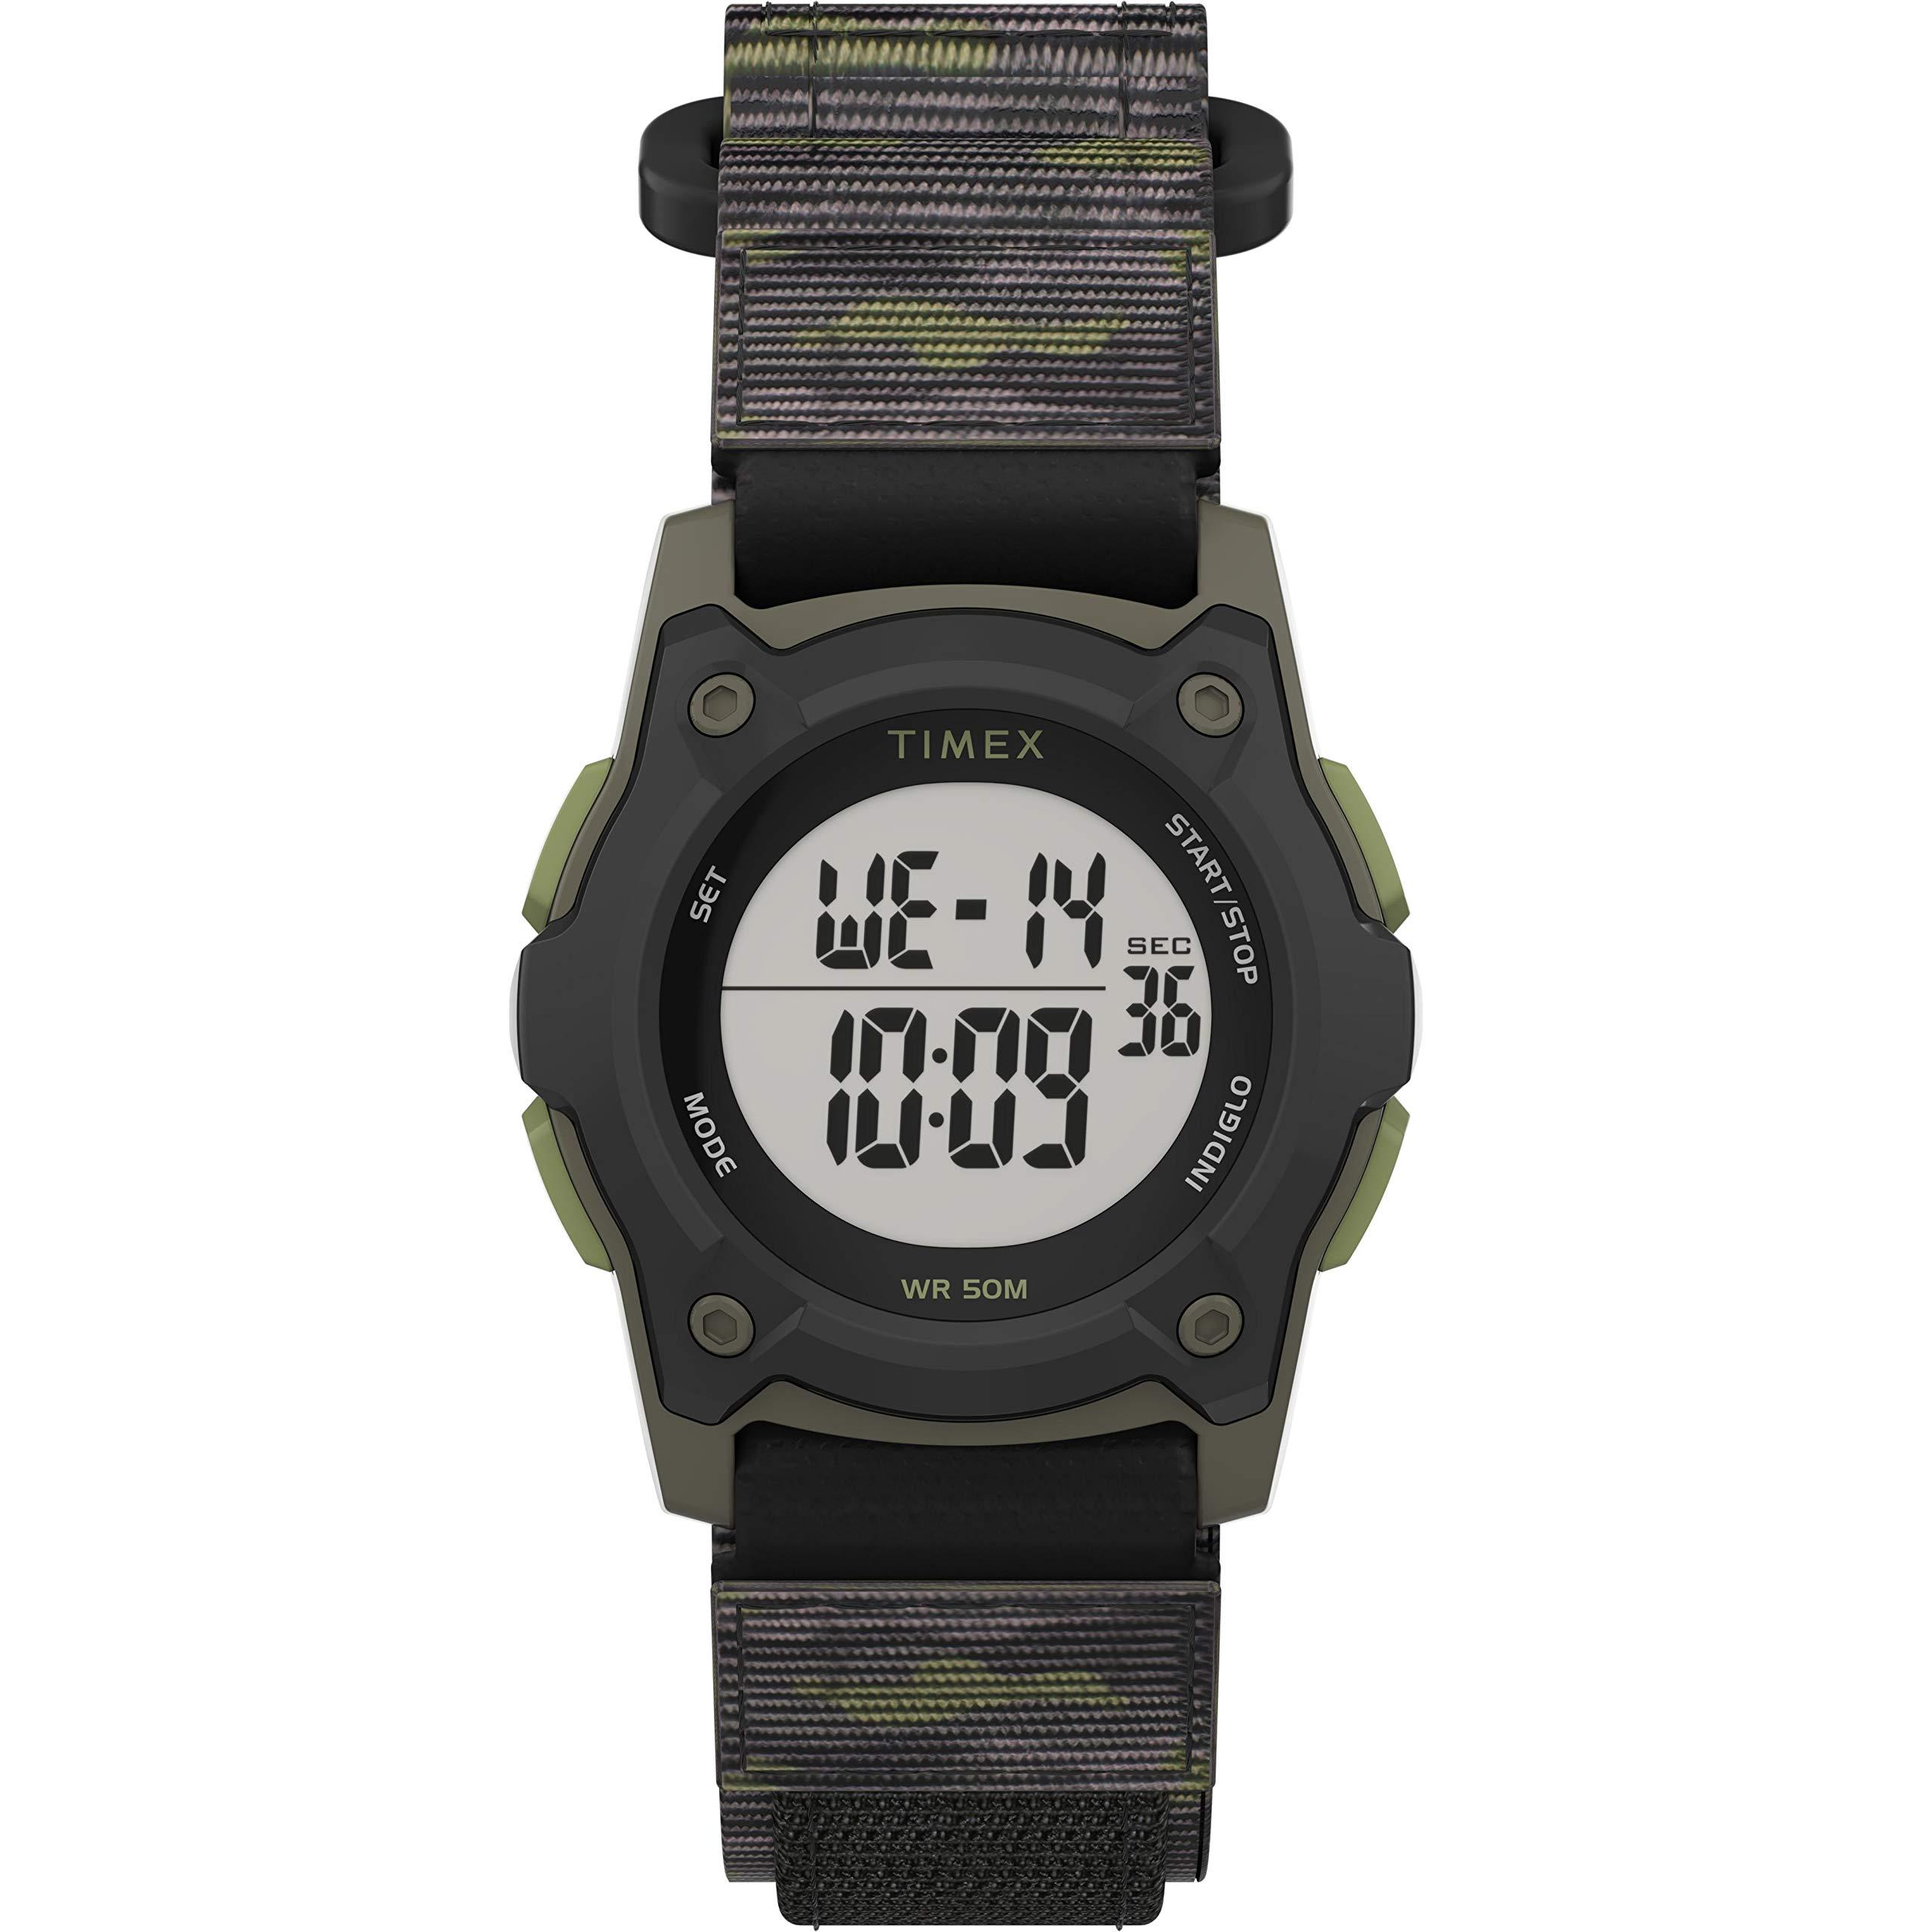 Timex Boys' Time Machines Digital Quartz Nylon Strap, Black, 18 Casual Watch (Model: TW7C775009J) by Timex